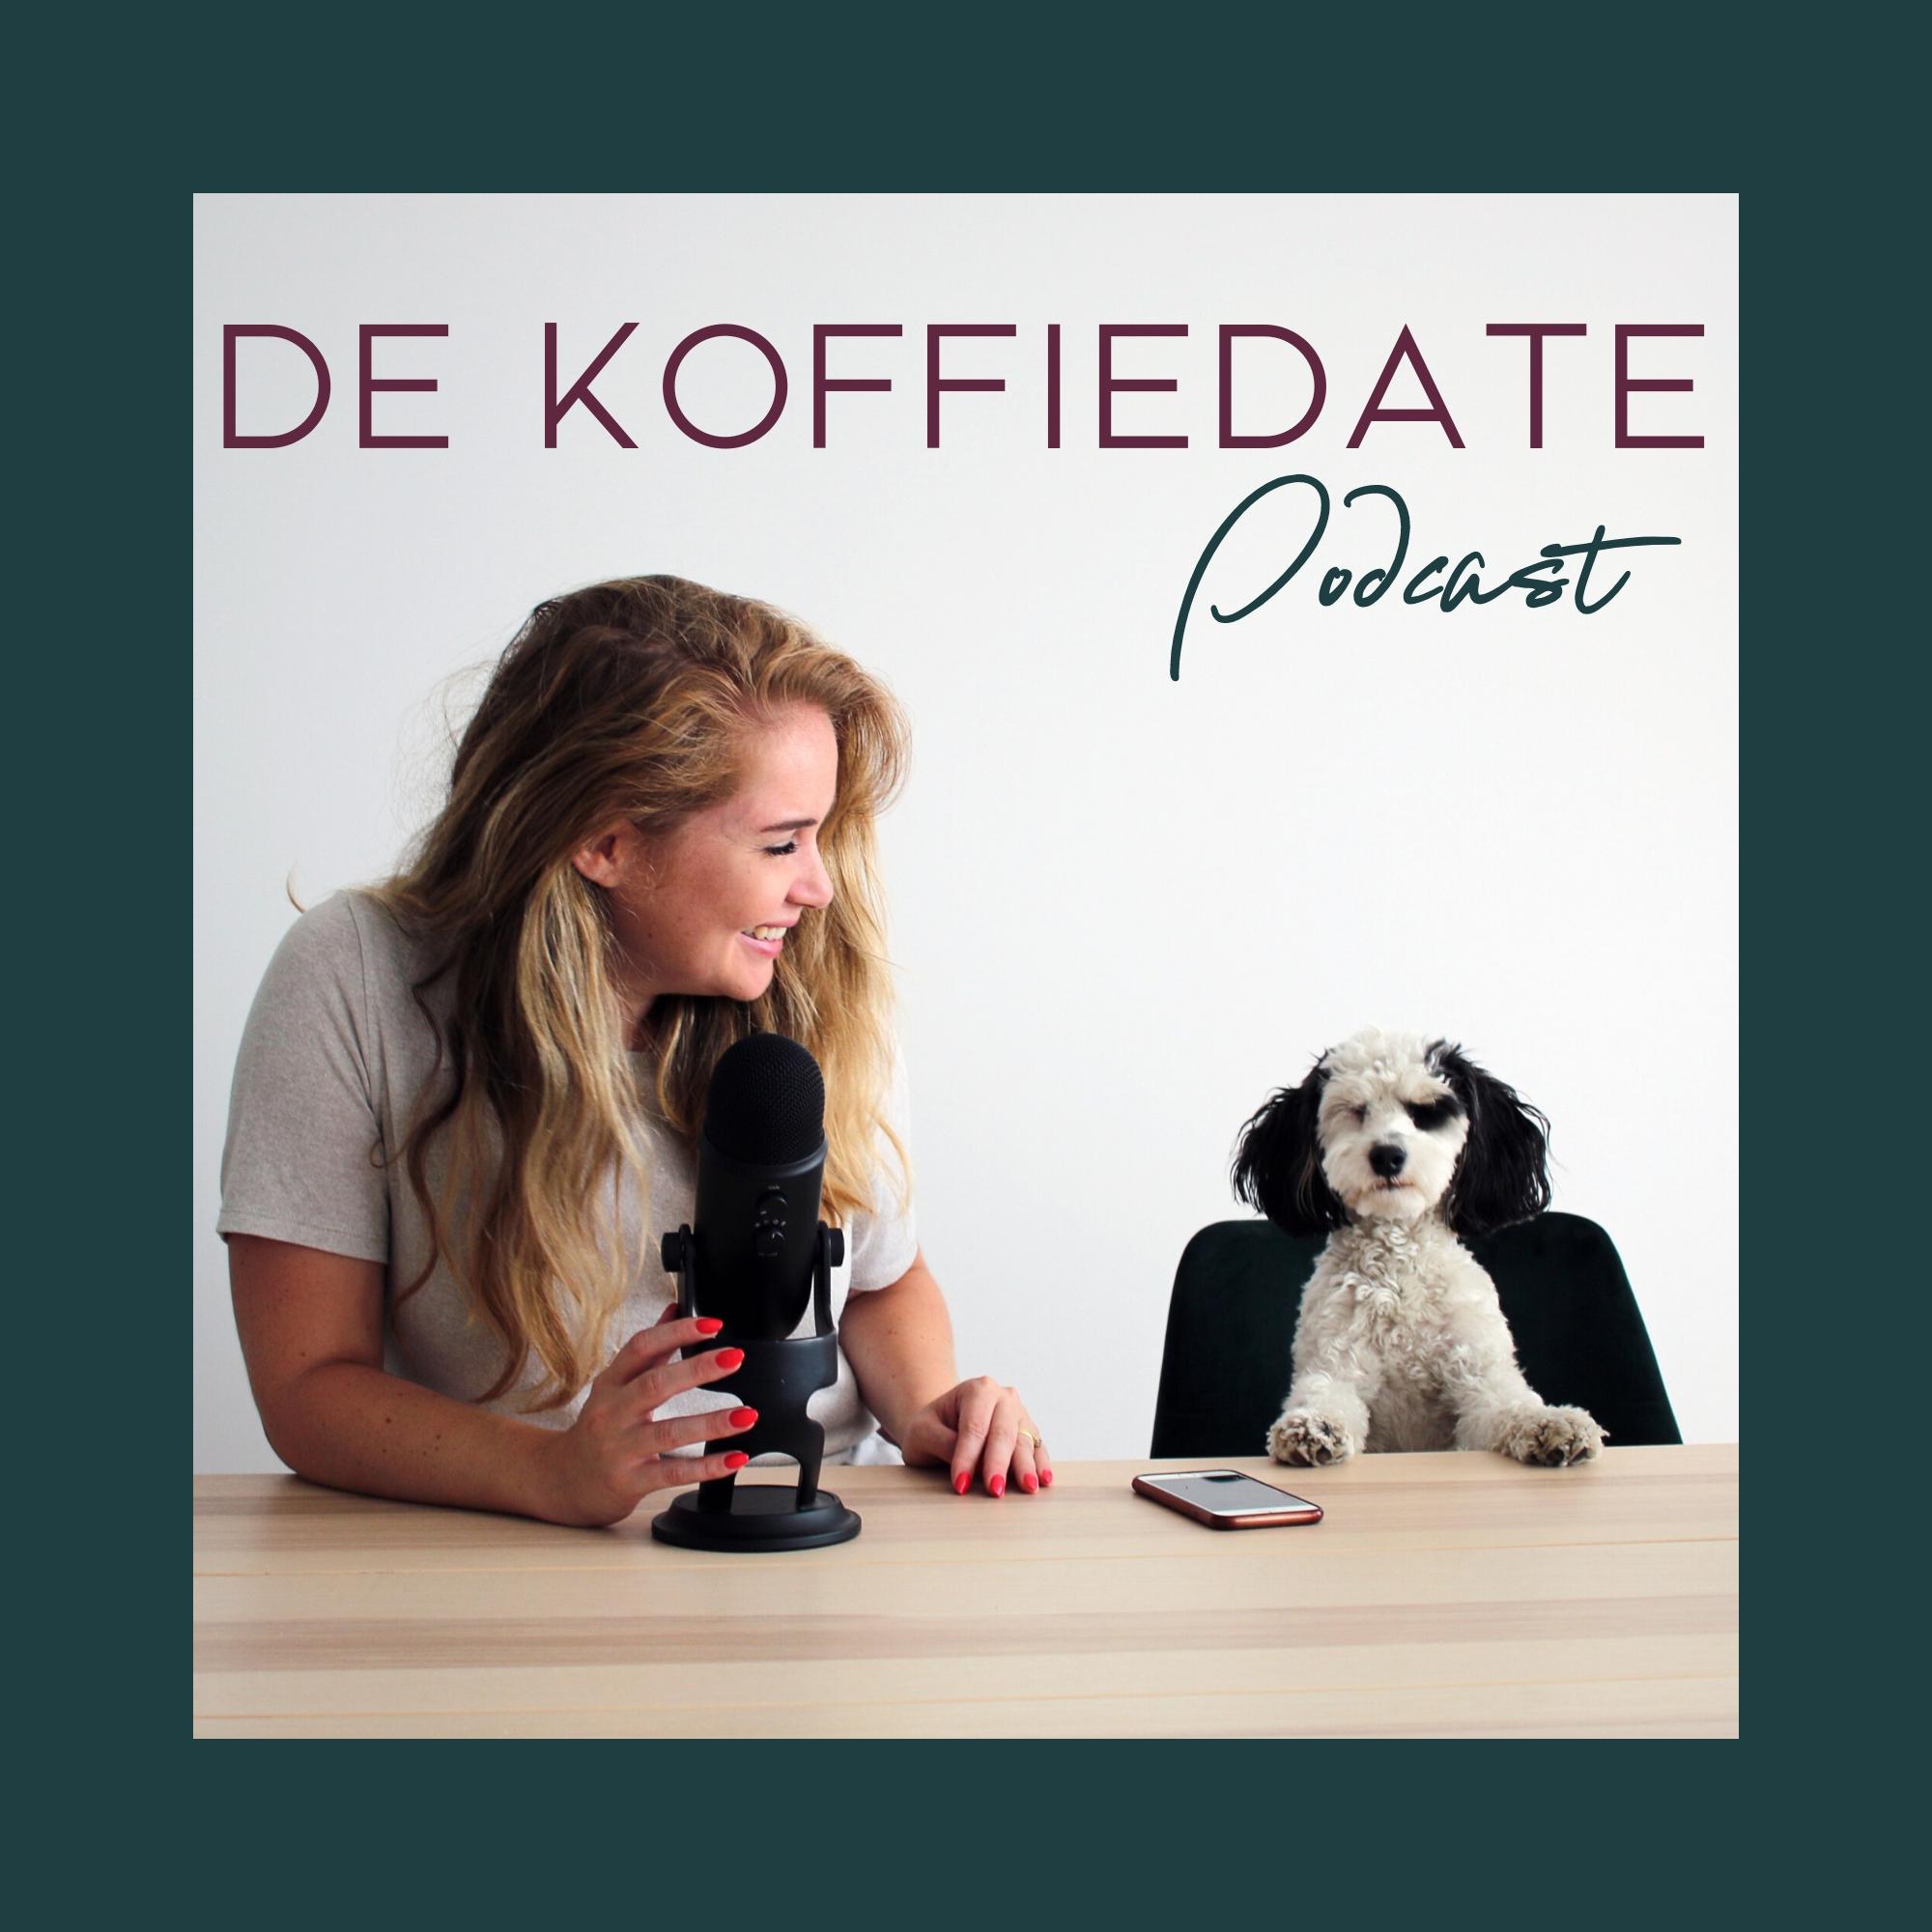 koffiedate podcast show art